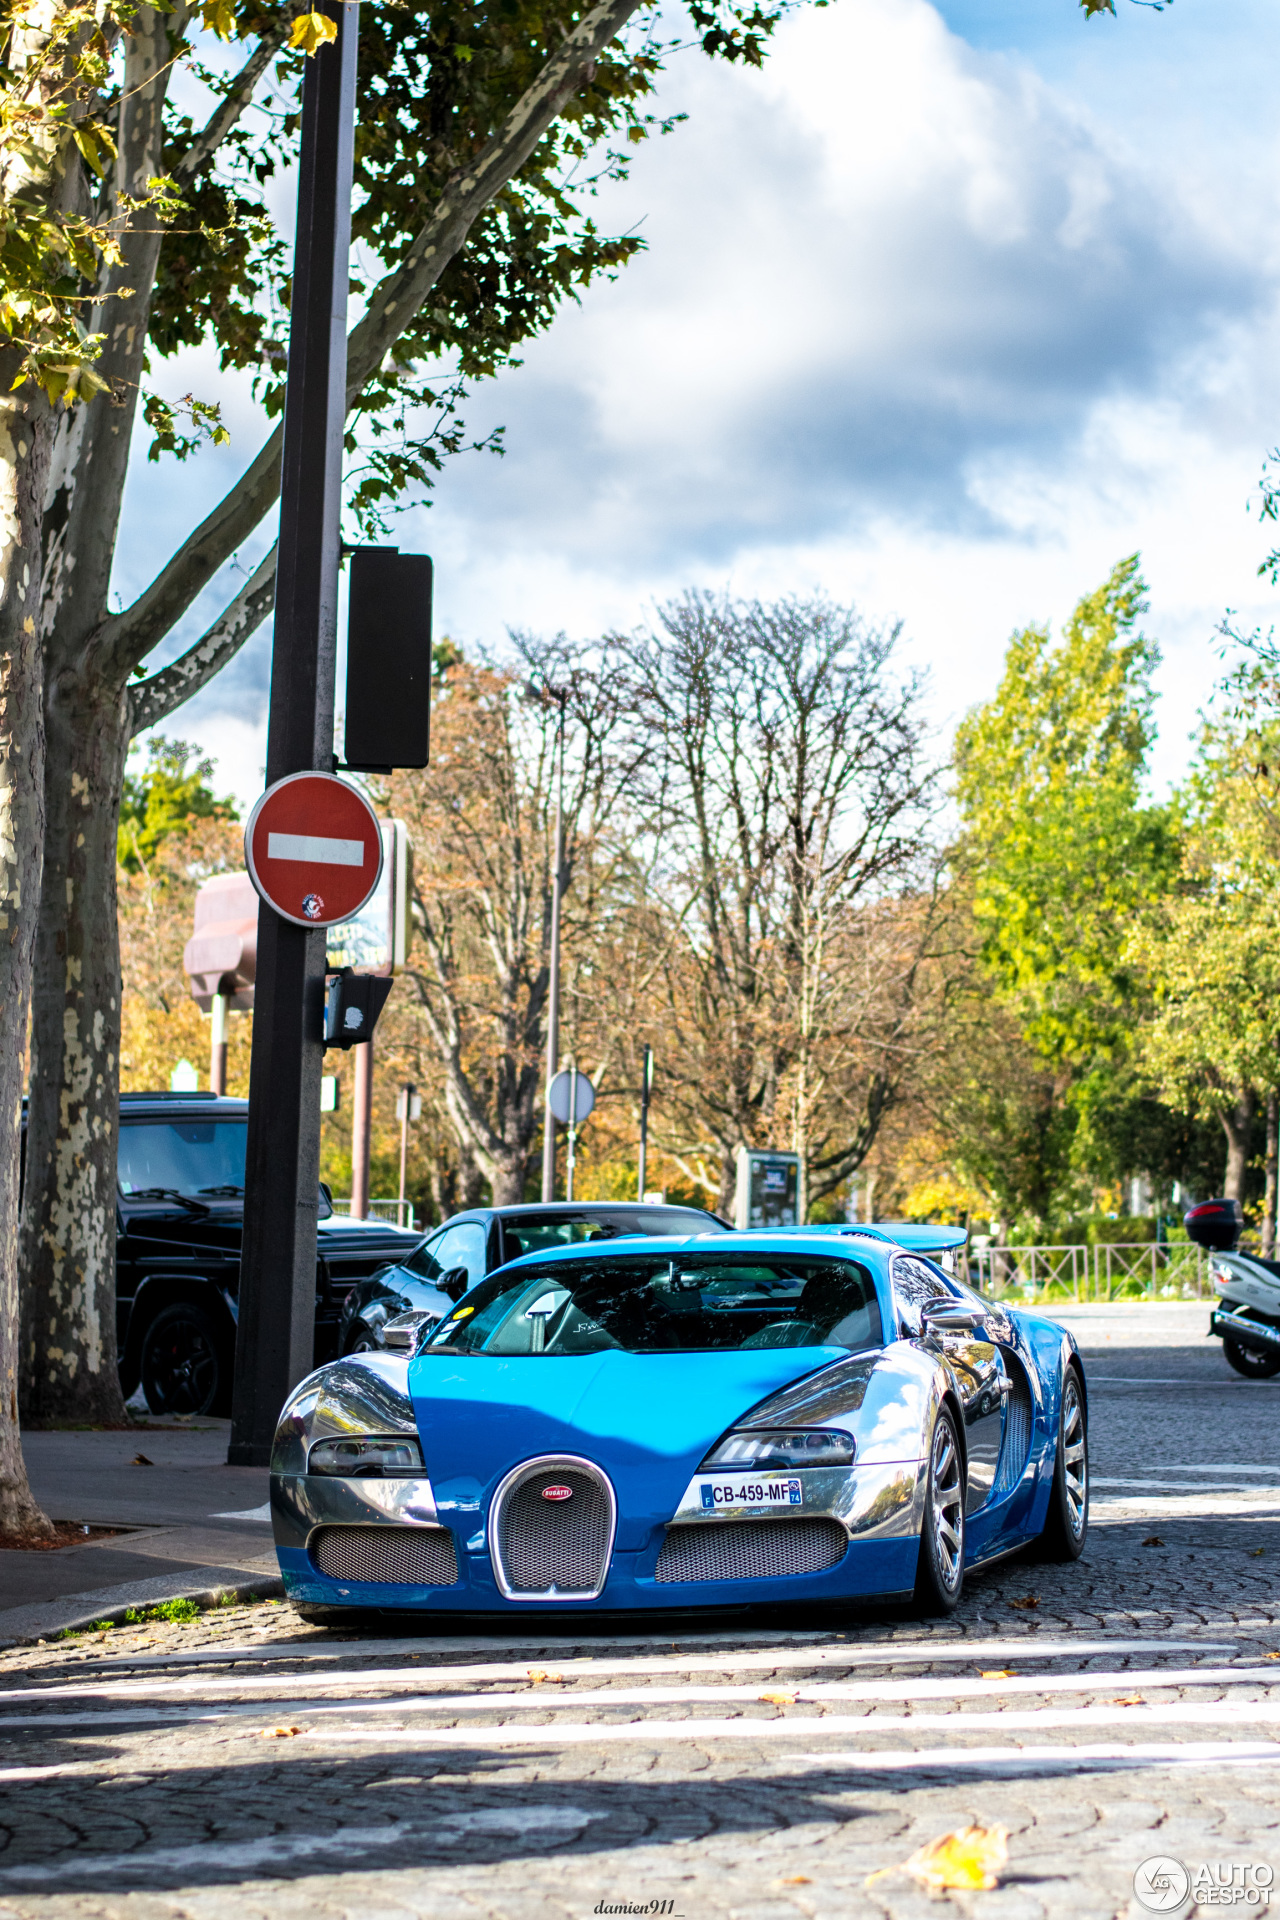 bugatti-veyron-164-centenaire-c987229102017011654_6 Stunning Bugatti Veyron Price In Brazil Cars Trend